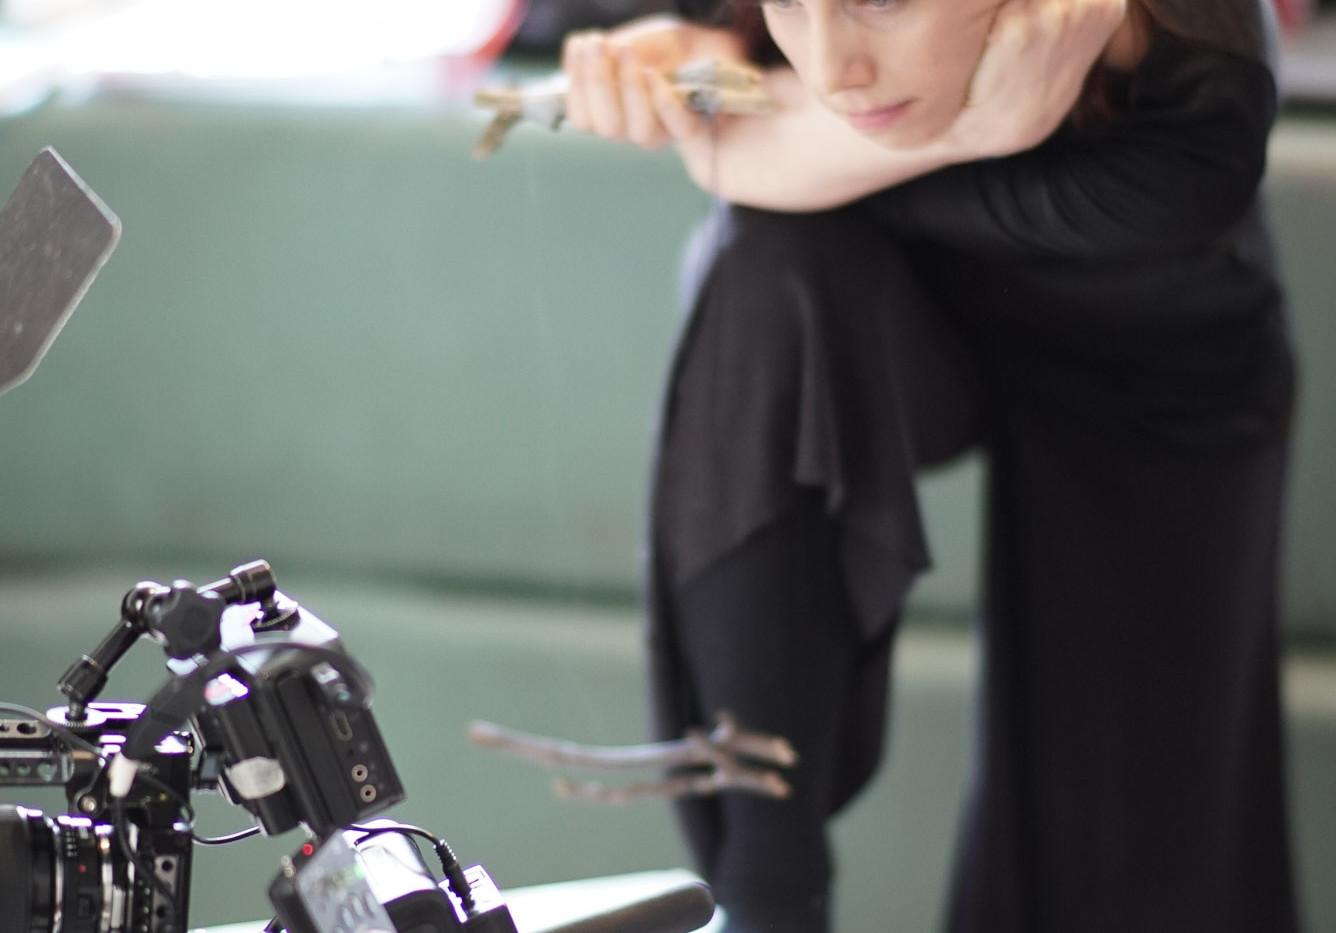 Filming 'The Fishsticks'